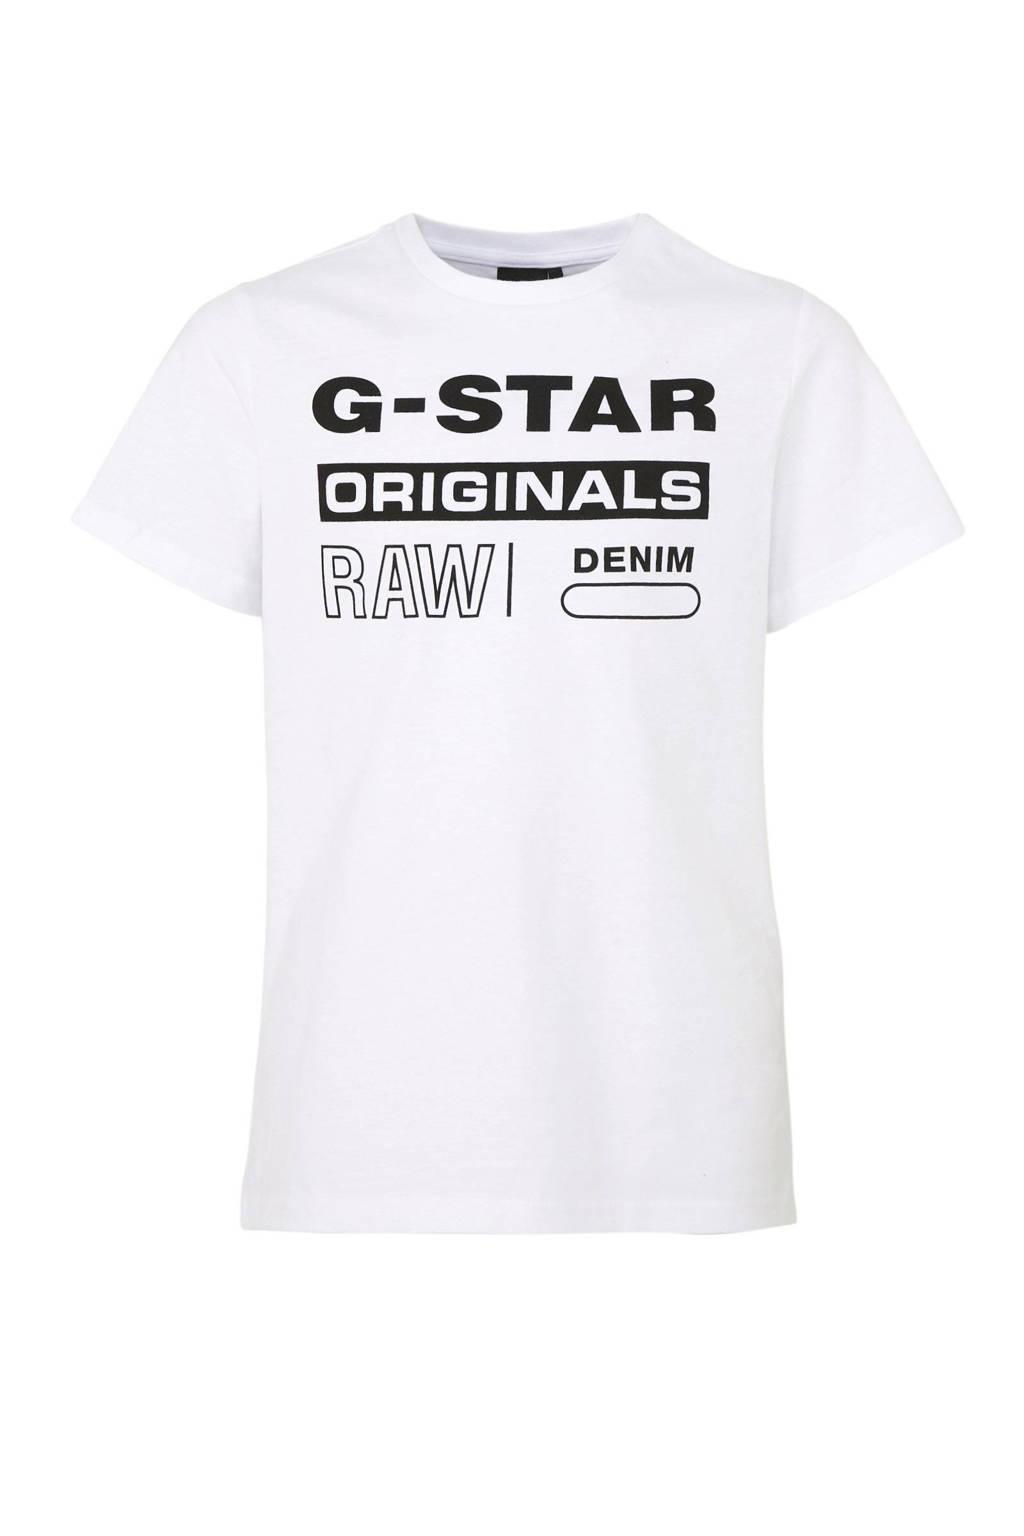 G-Star RAW T-shirt met logo wit, Wit